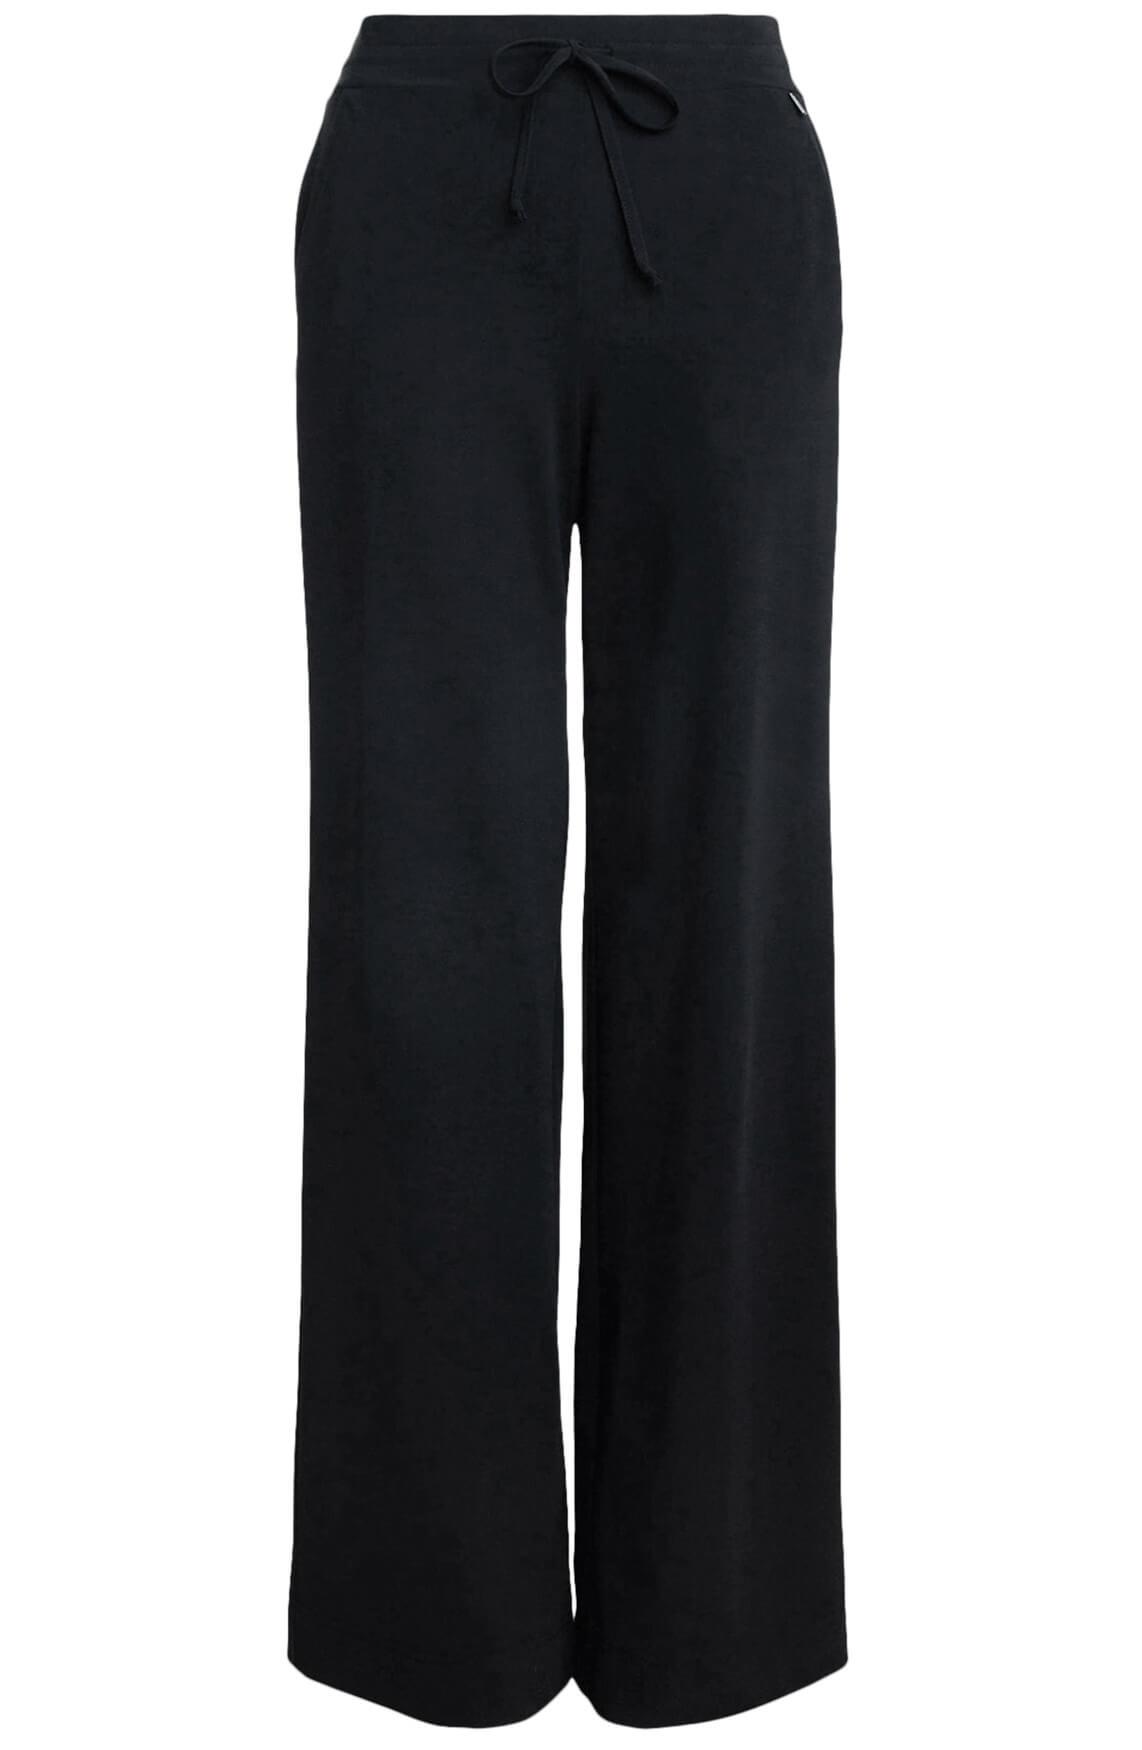 Anna Dames Jogpantalon van travel kwaliteit Zwart